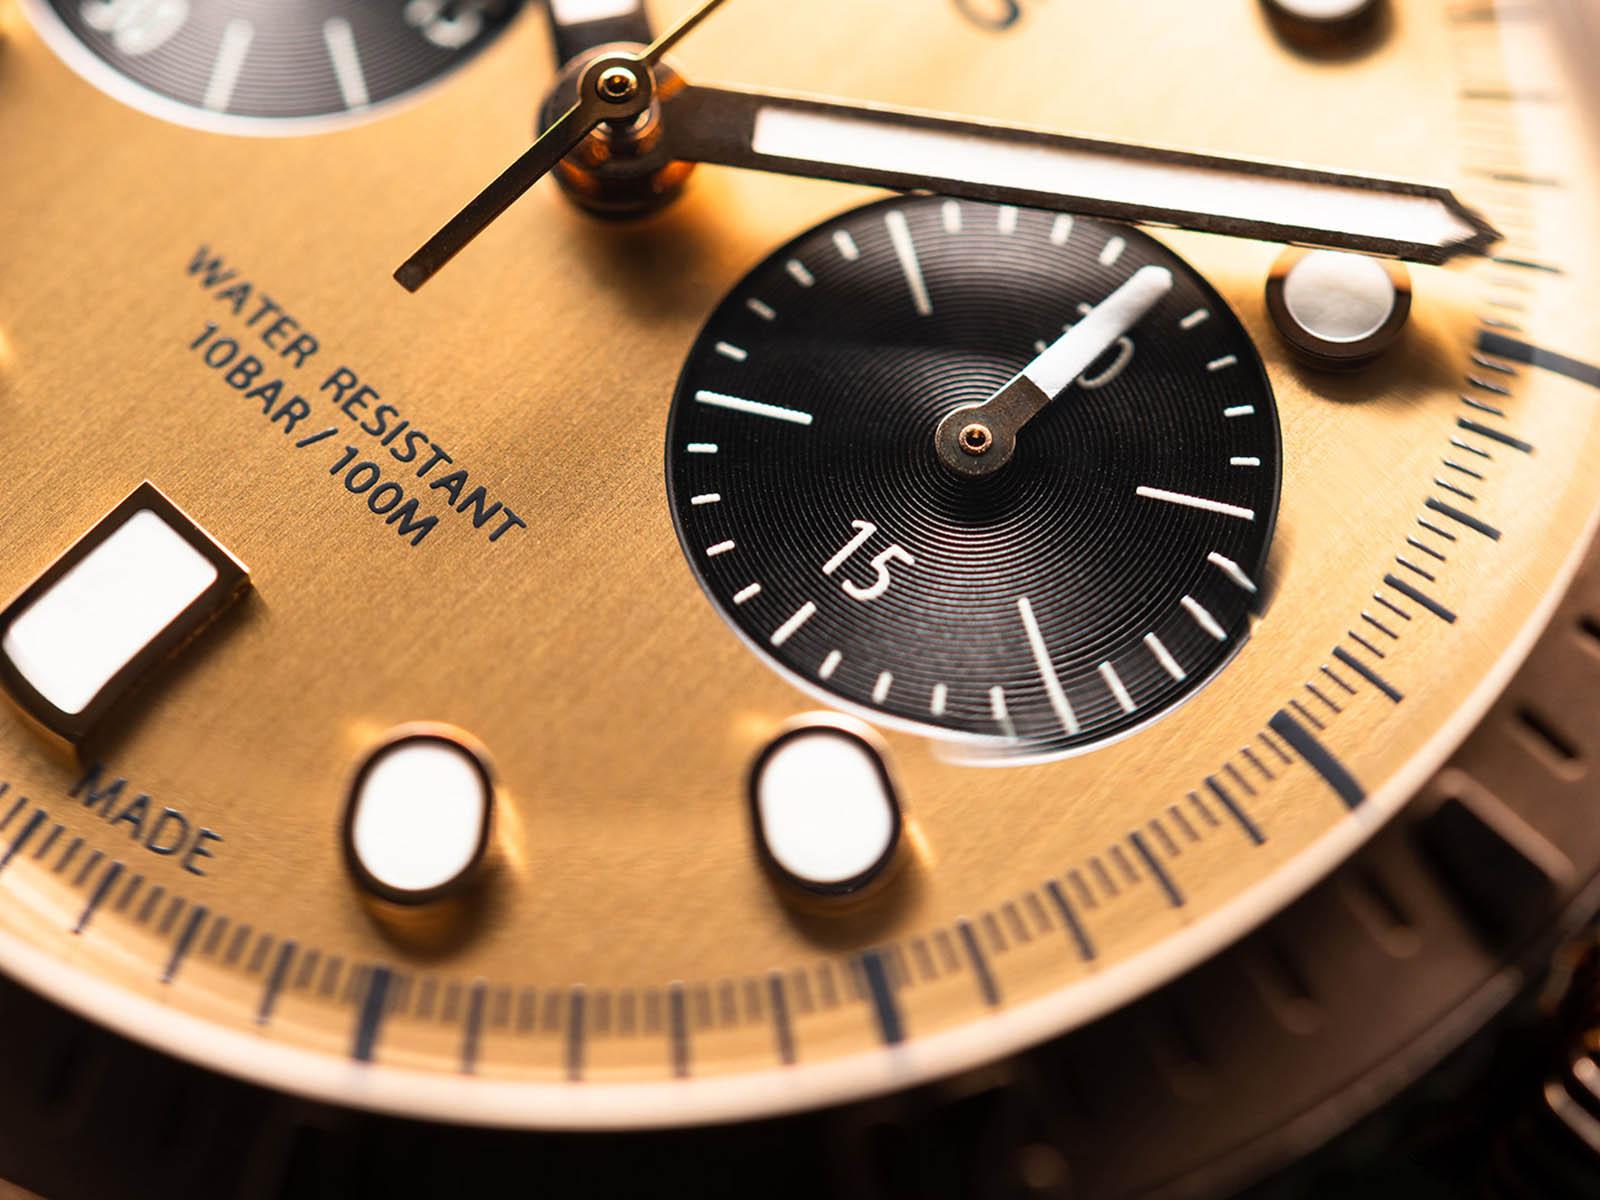 01-771-7744-3182-set-oris-divers-sixty-five-chronograph-holstein-edition-3.jpg